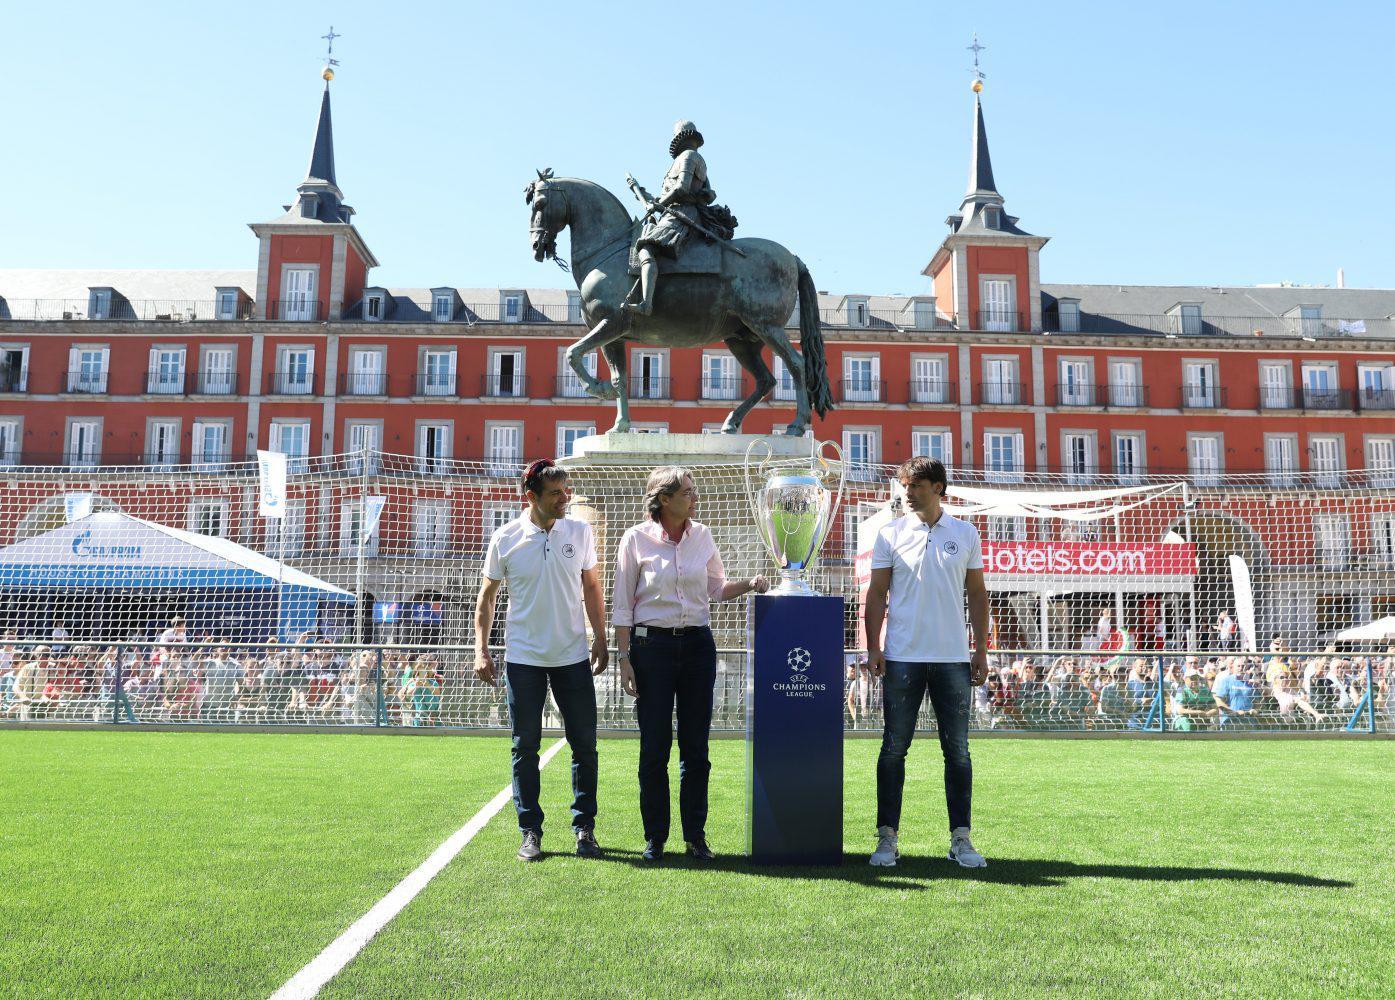 futbol español hoy atletico de madrid